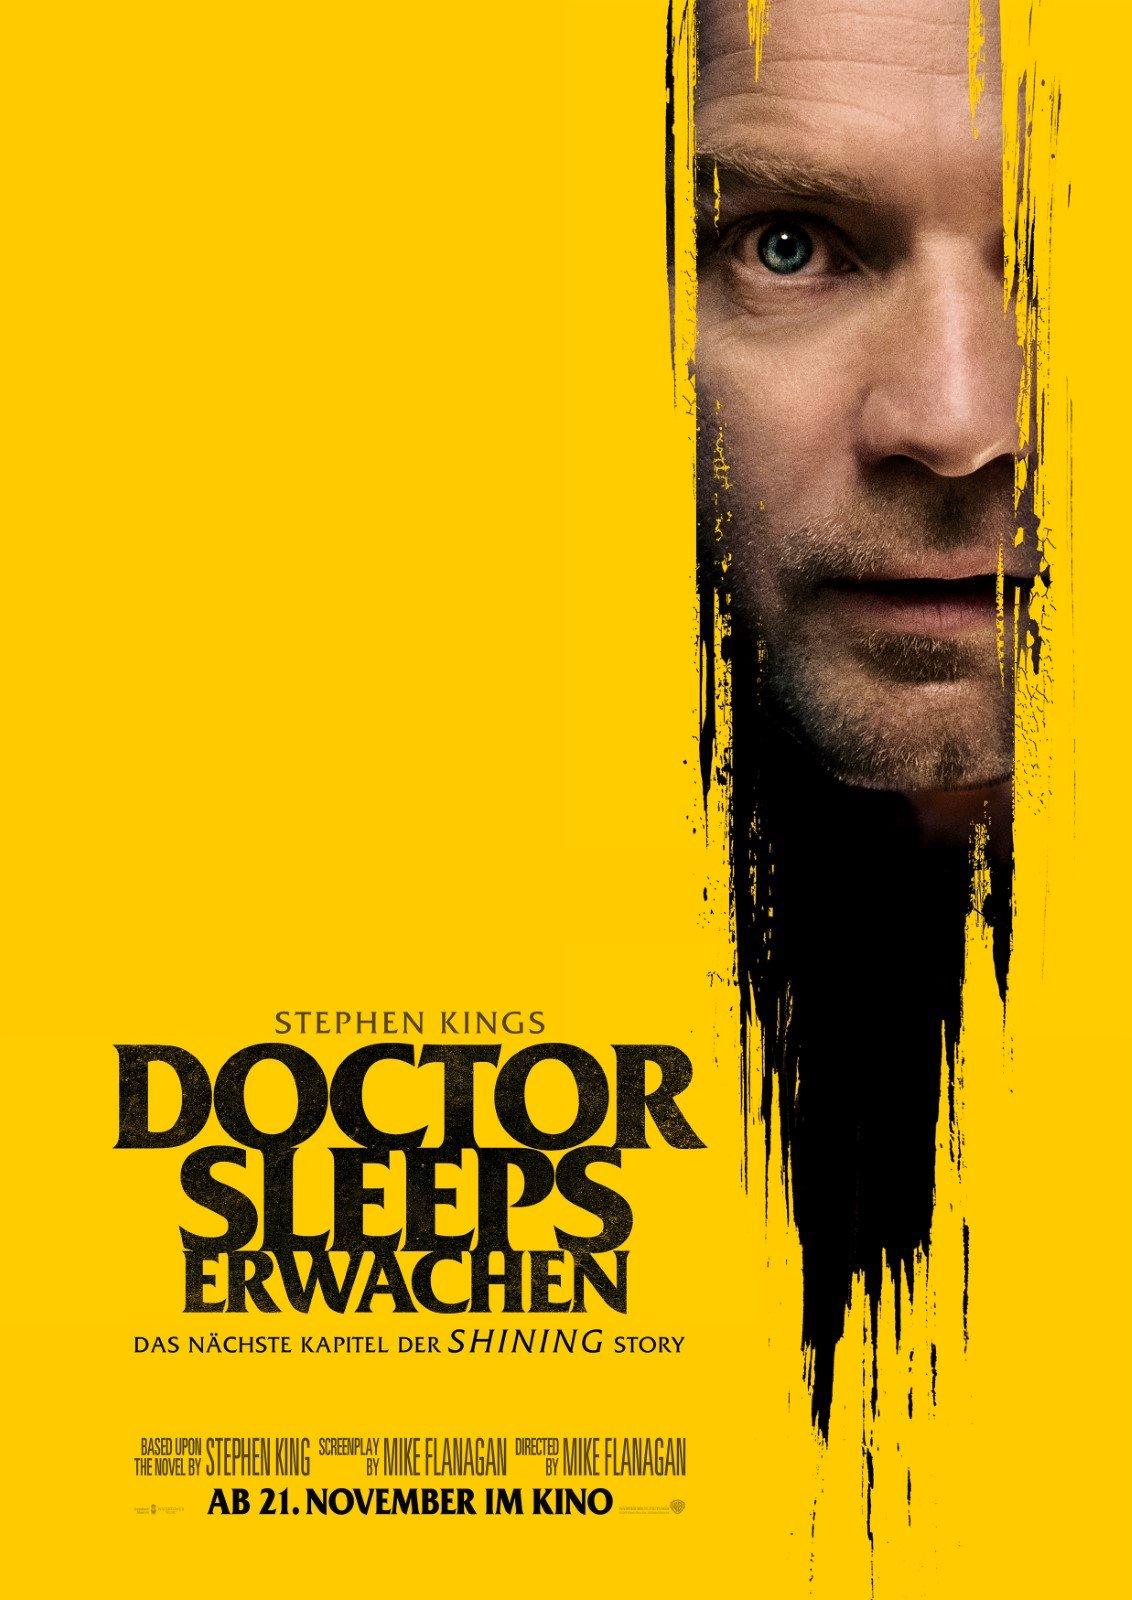 Stephen Kings Doctor Sleeps Erwachen   Film 20   FILMSTARTS.de